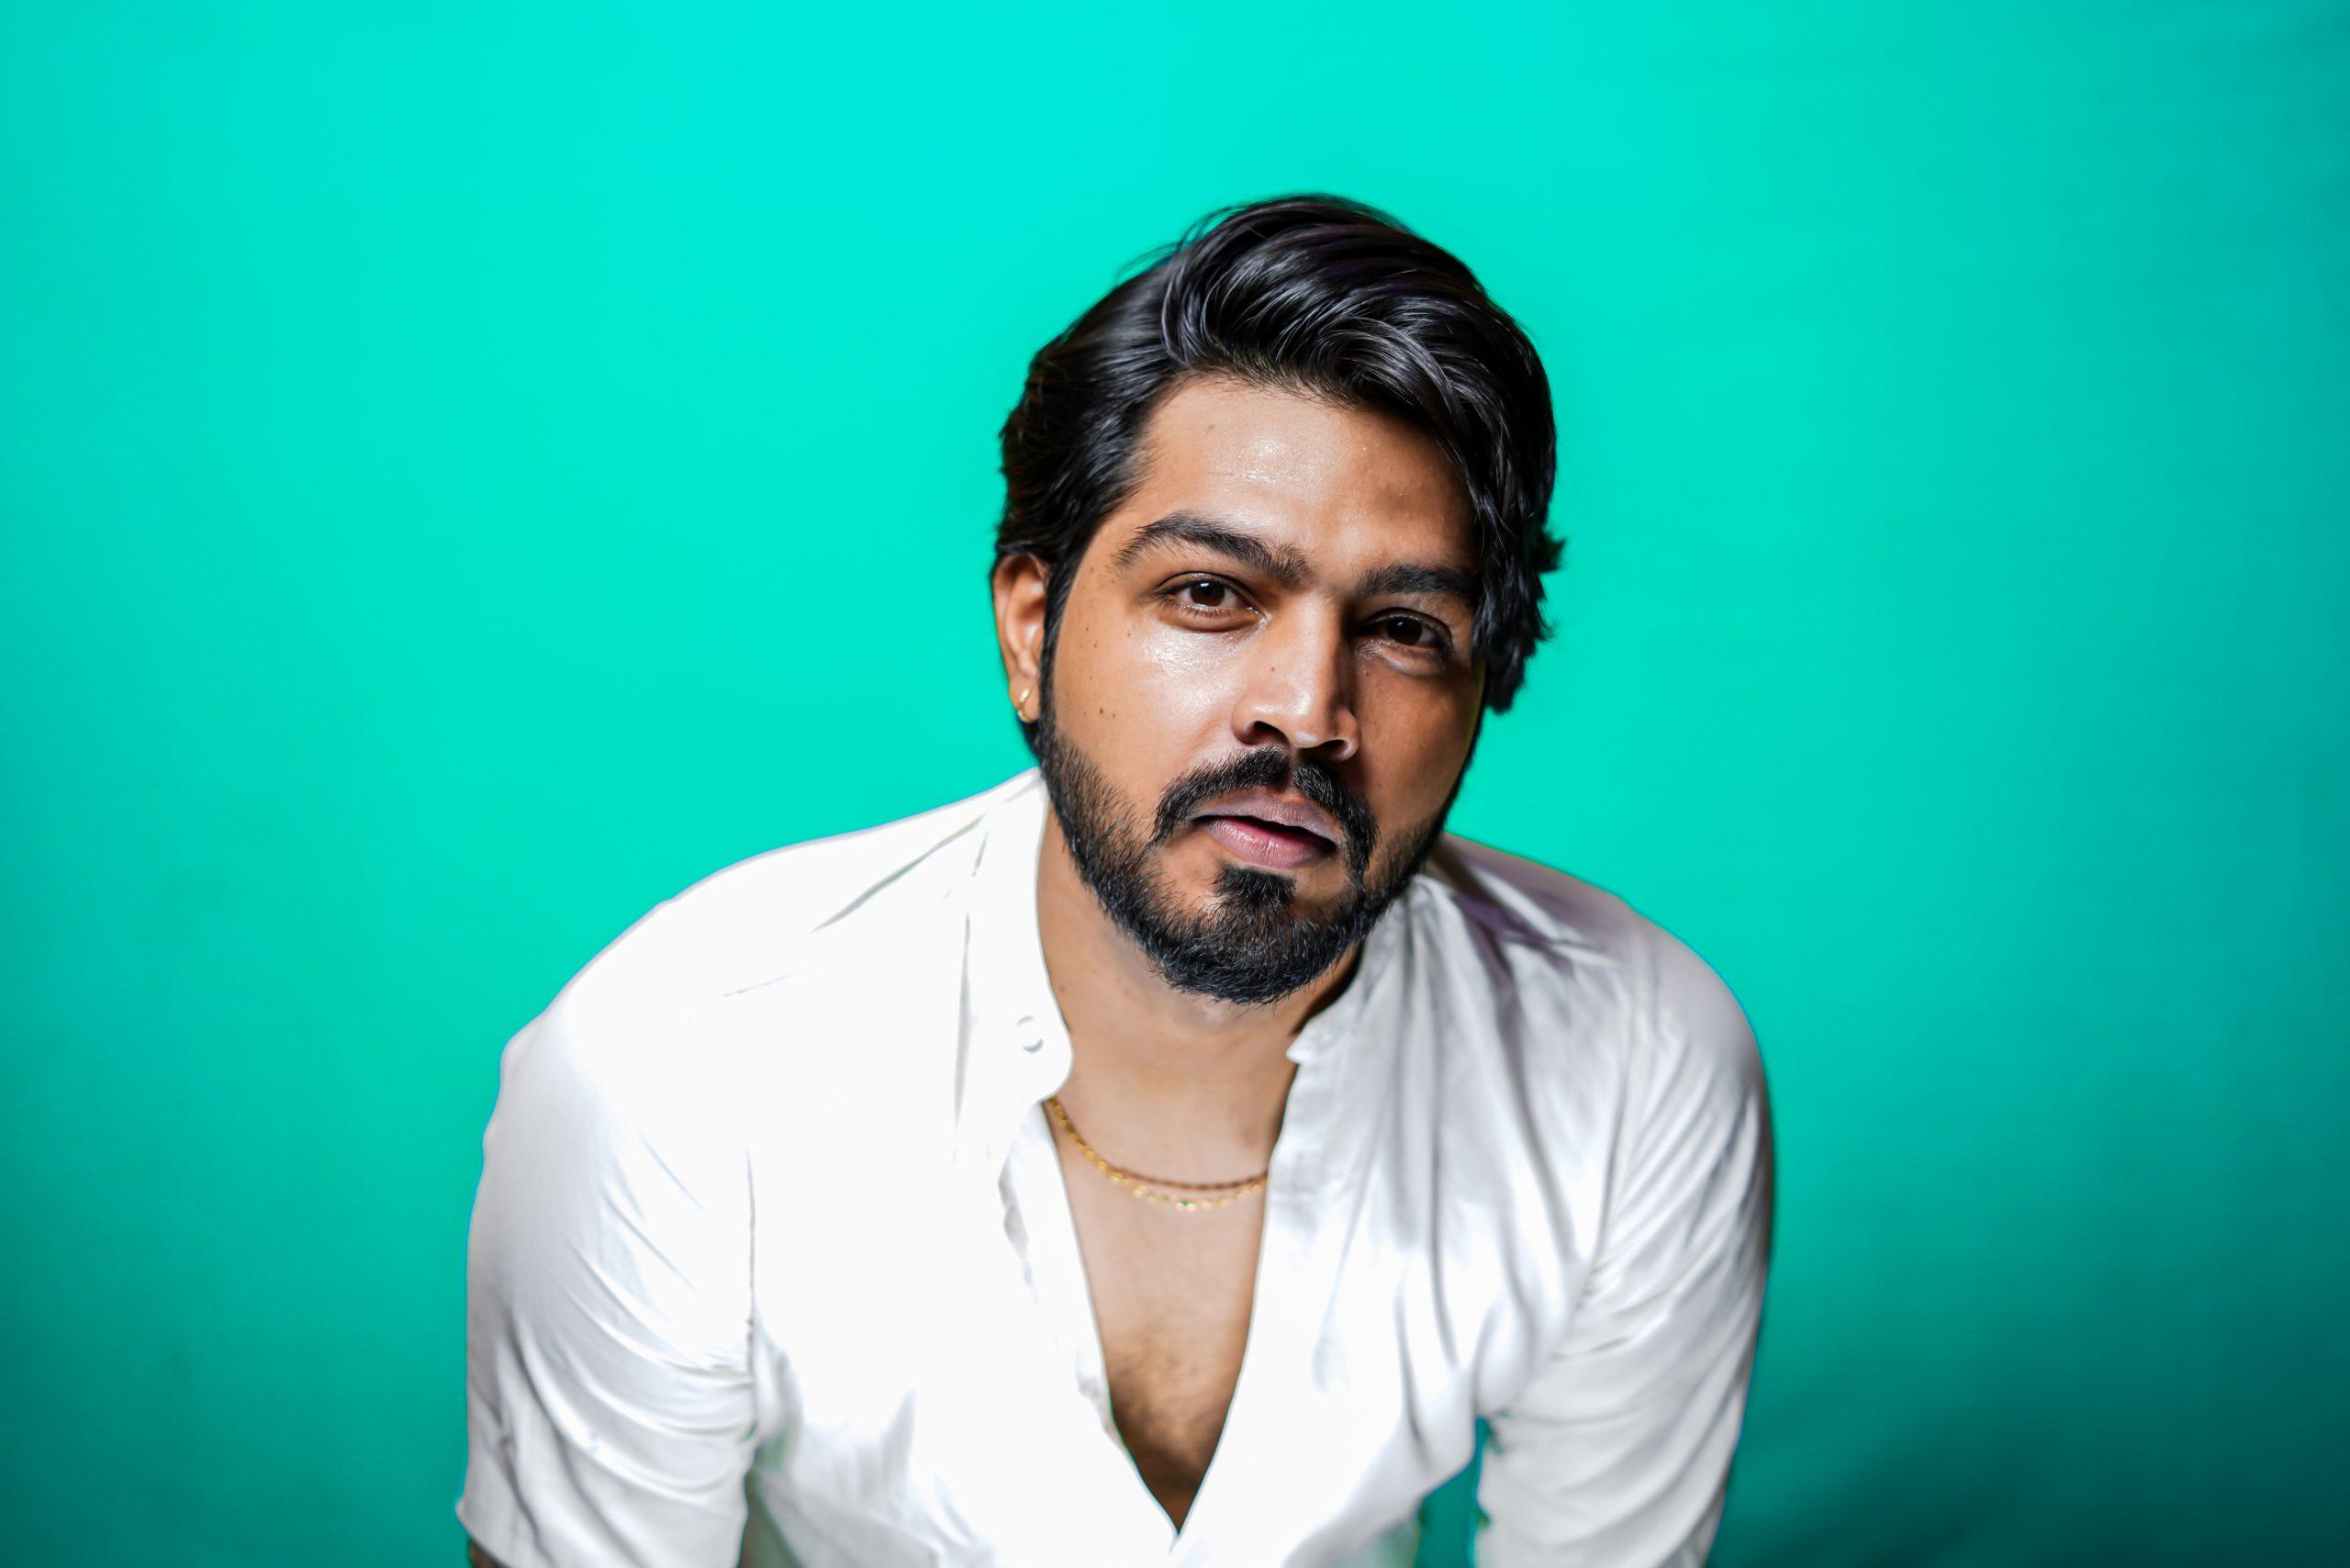 Indian Man Portrait on Green Background